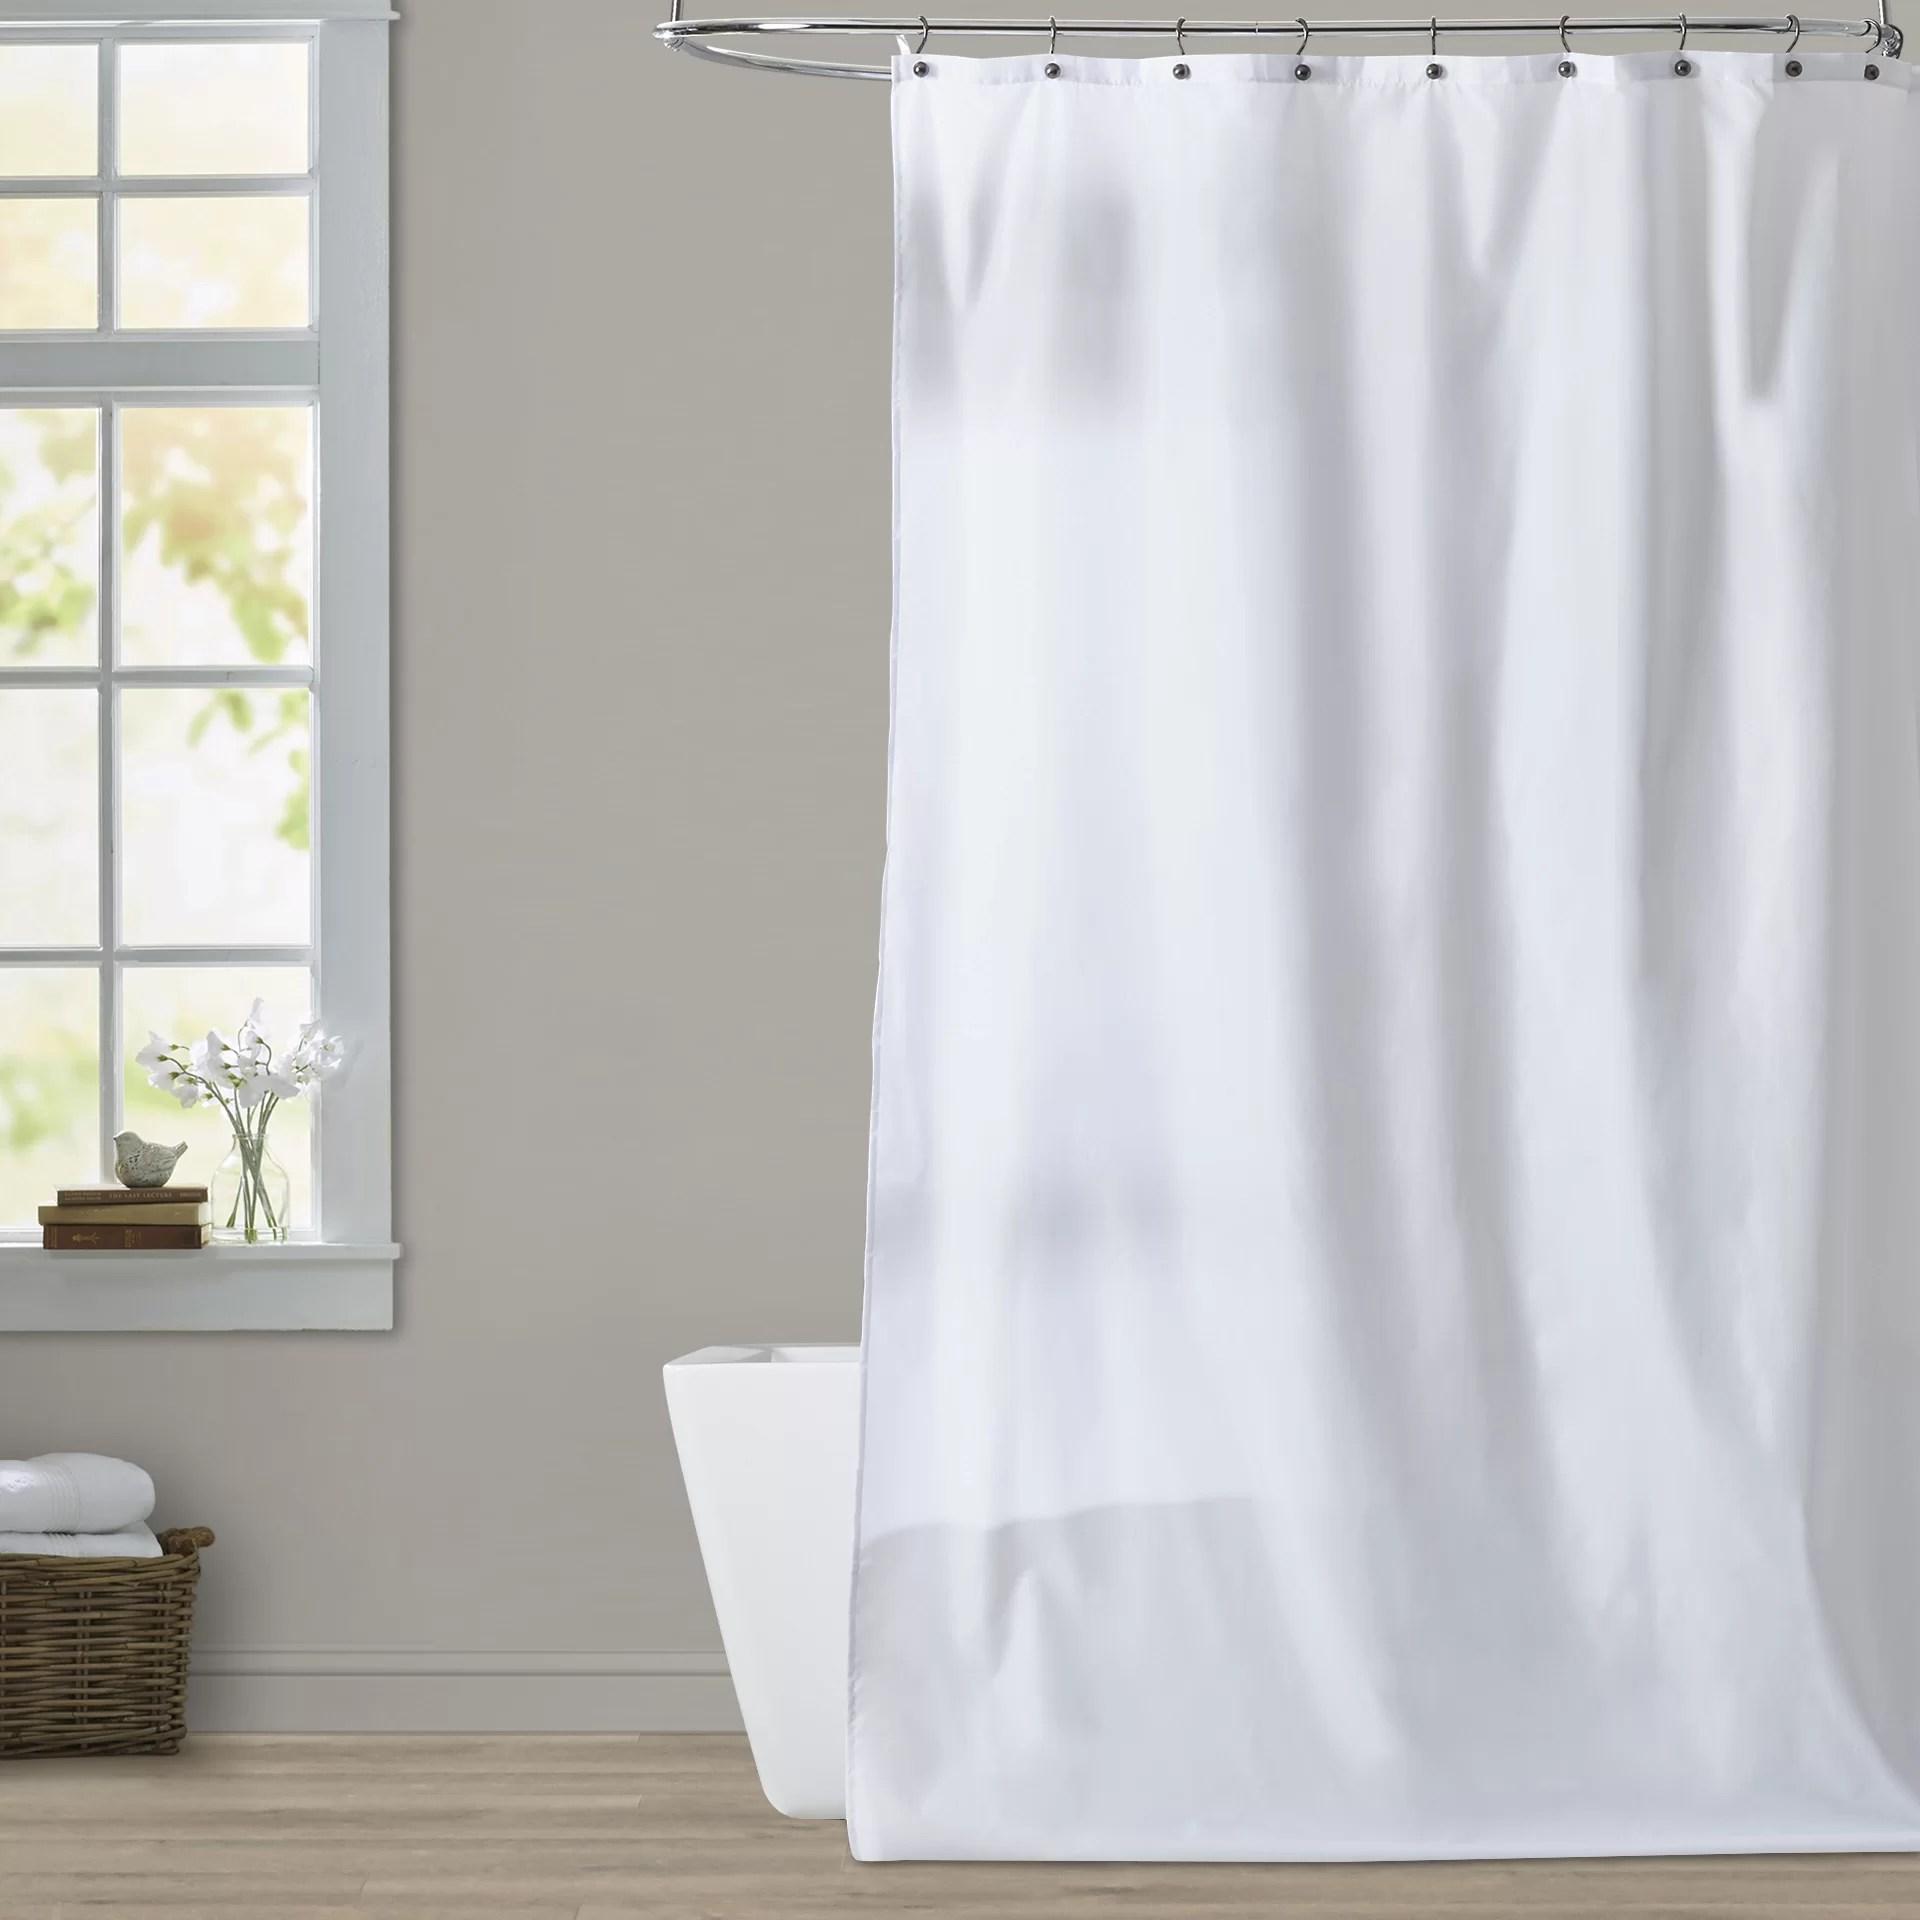 B and q long shower curtain curtain menzilperde net for B q bathroom accessories